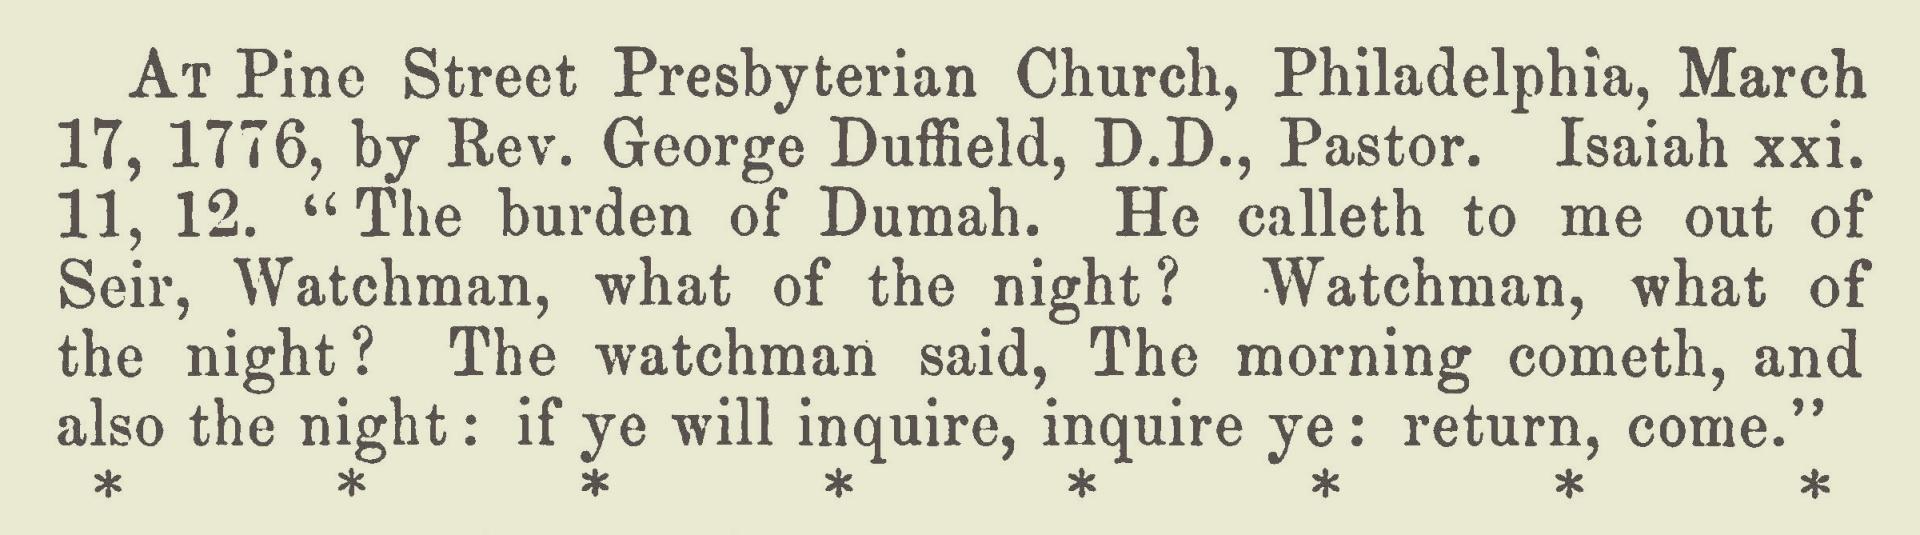 Duffield, II, George, March 17, 1776 Sermon Title Page.jpg